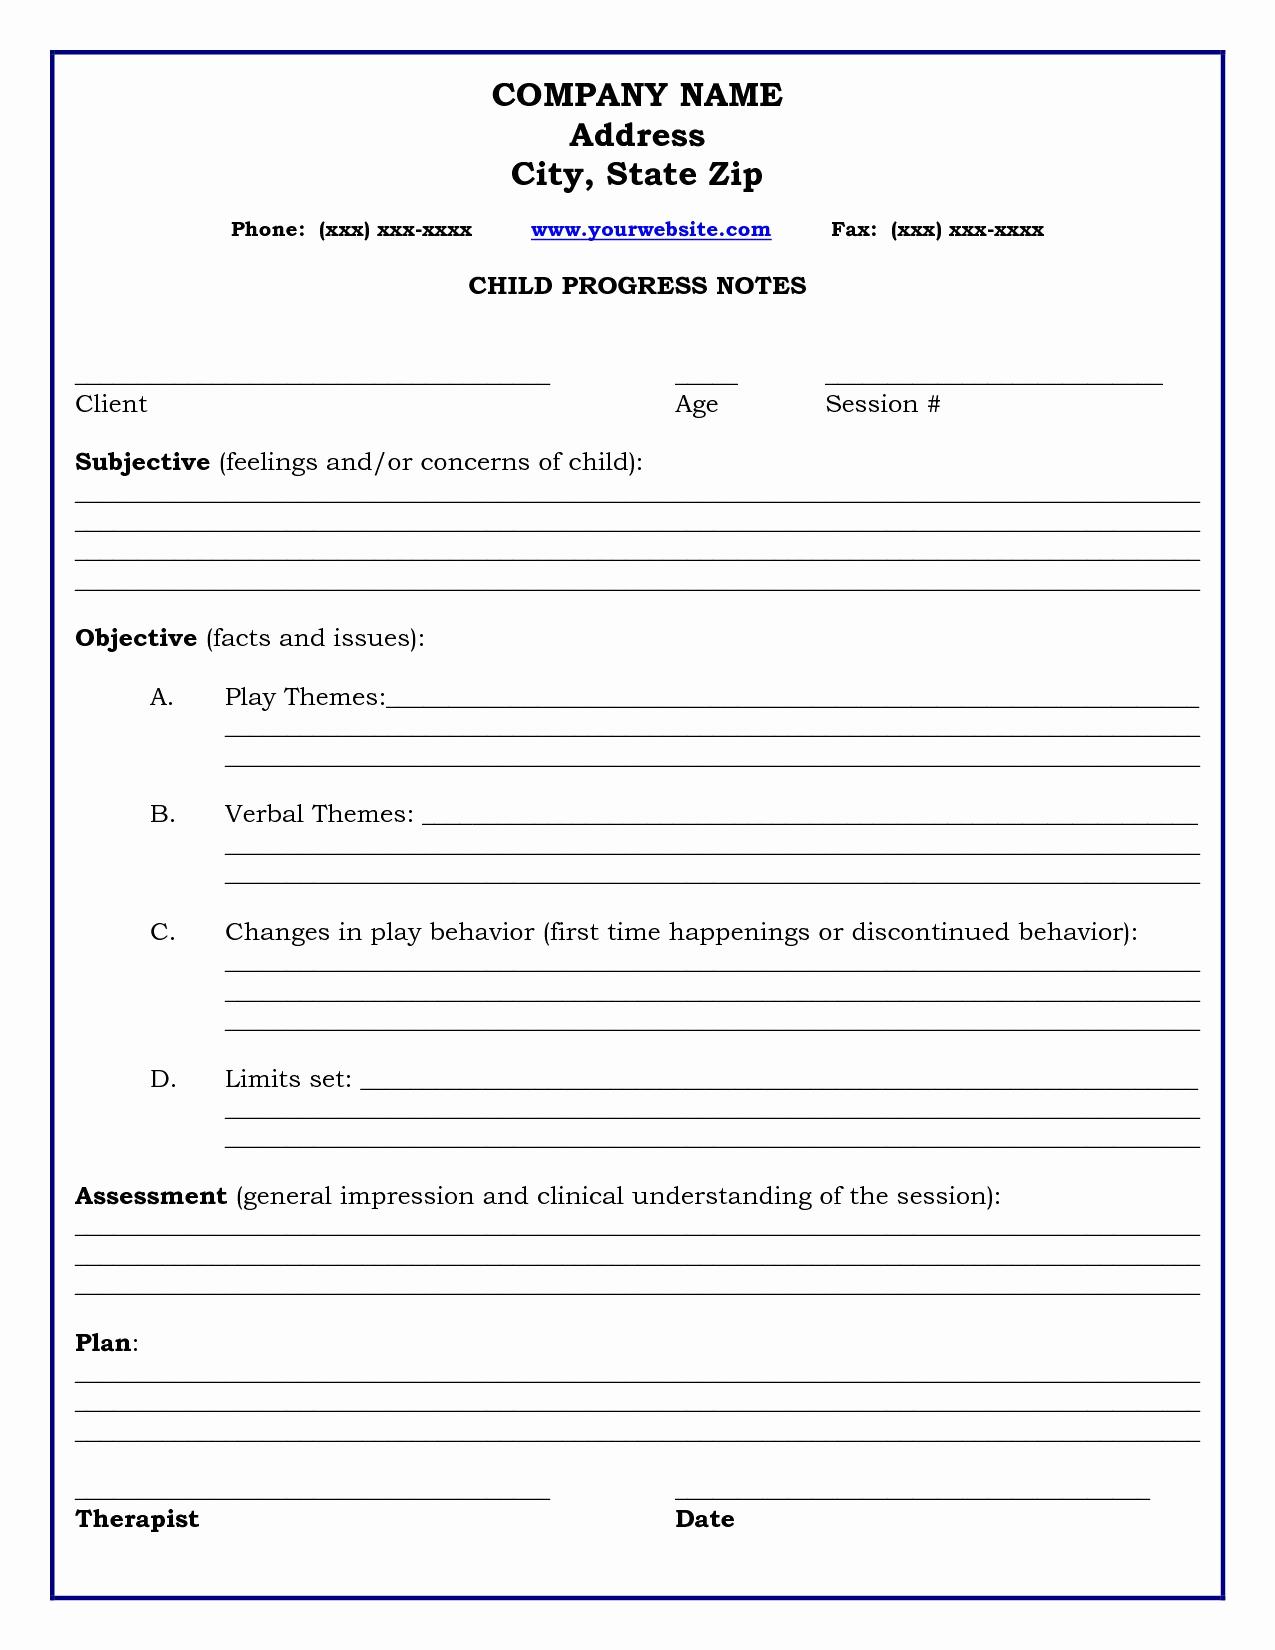 Progress Note Template Pdf Inspirational Psychotherapy Progress Note Template Pdf Example Resume